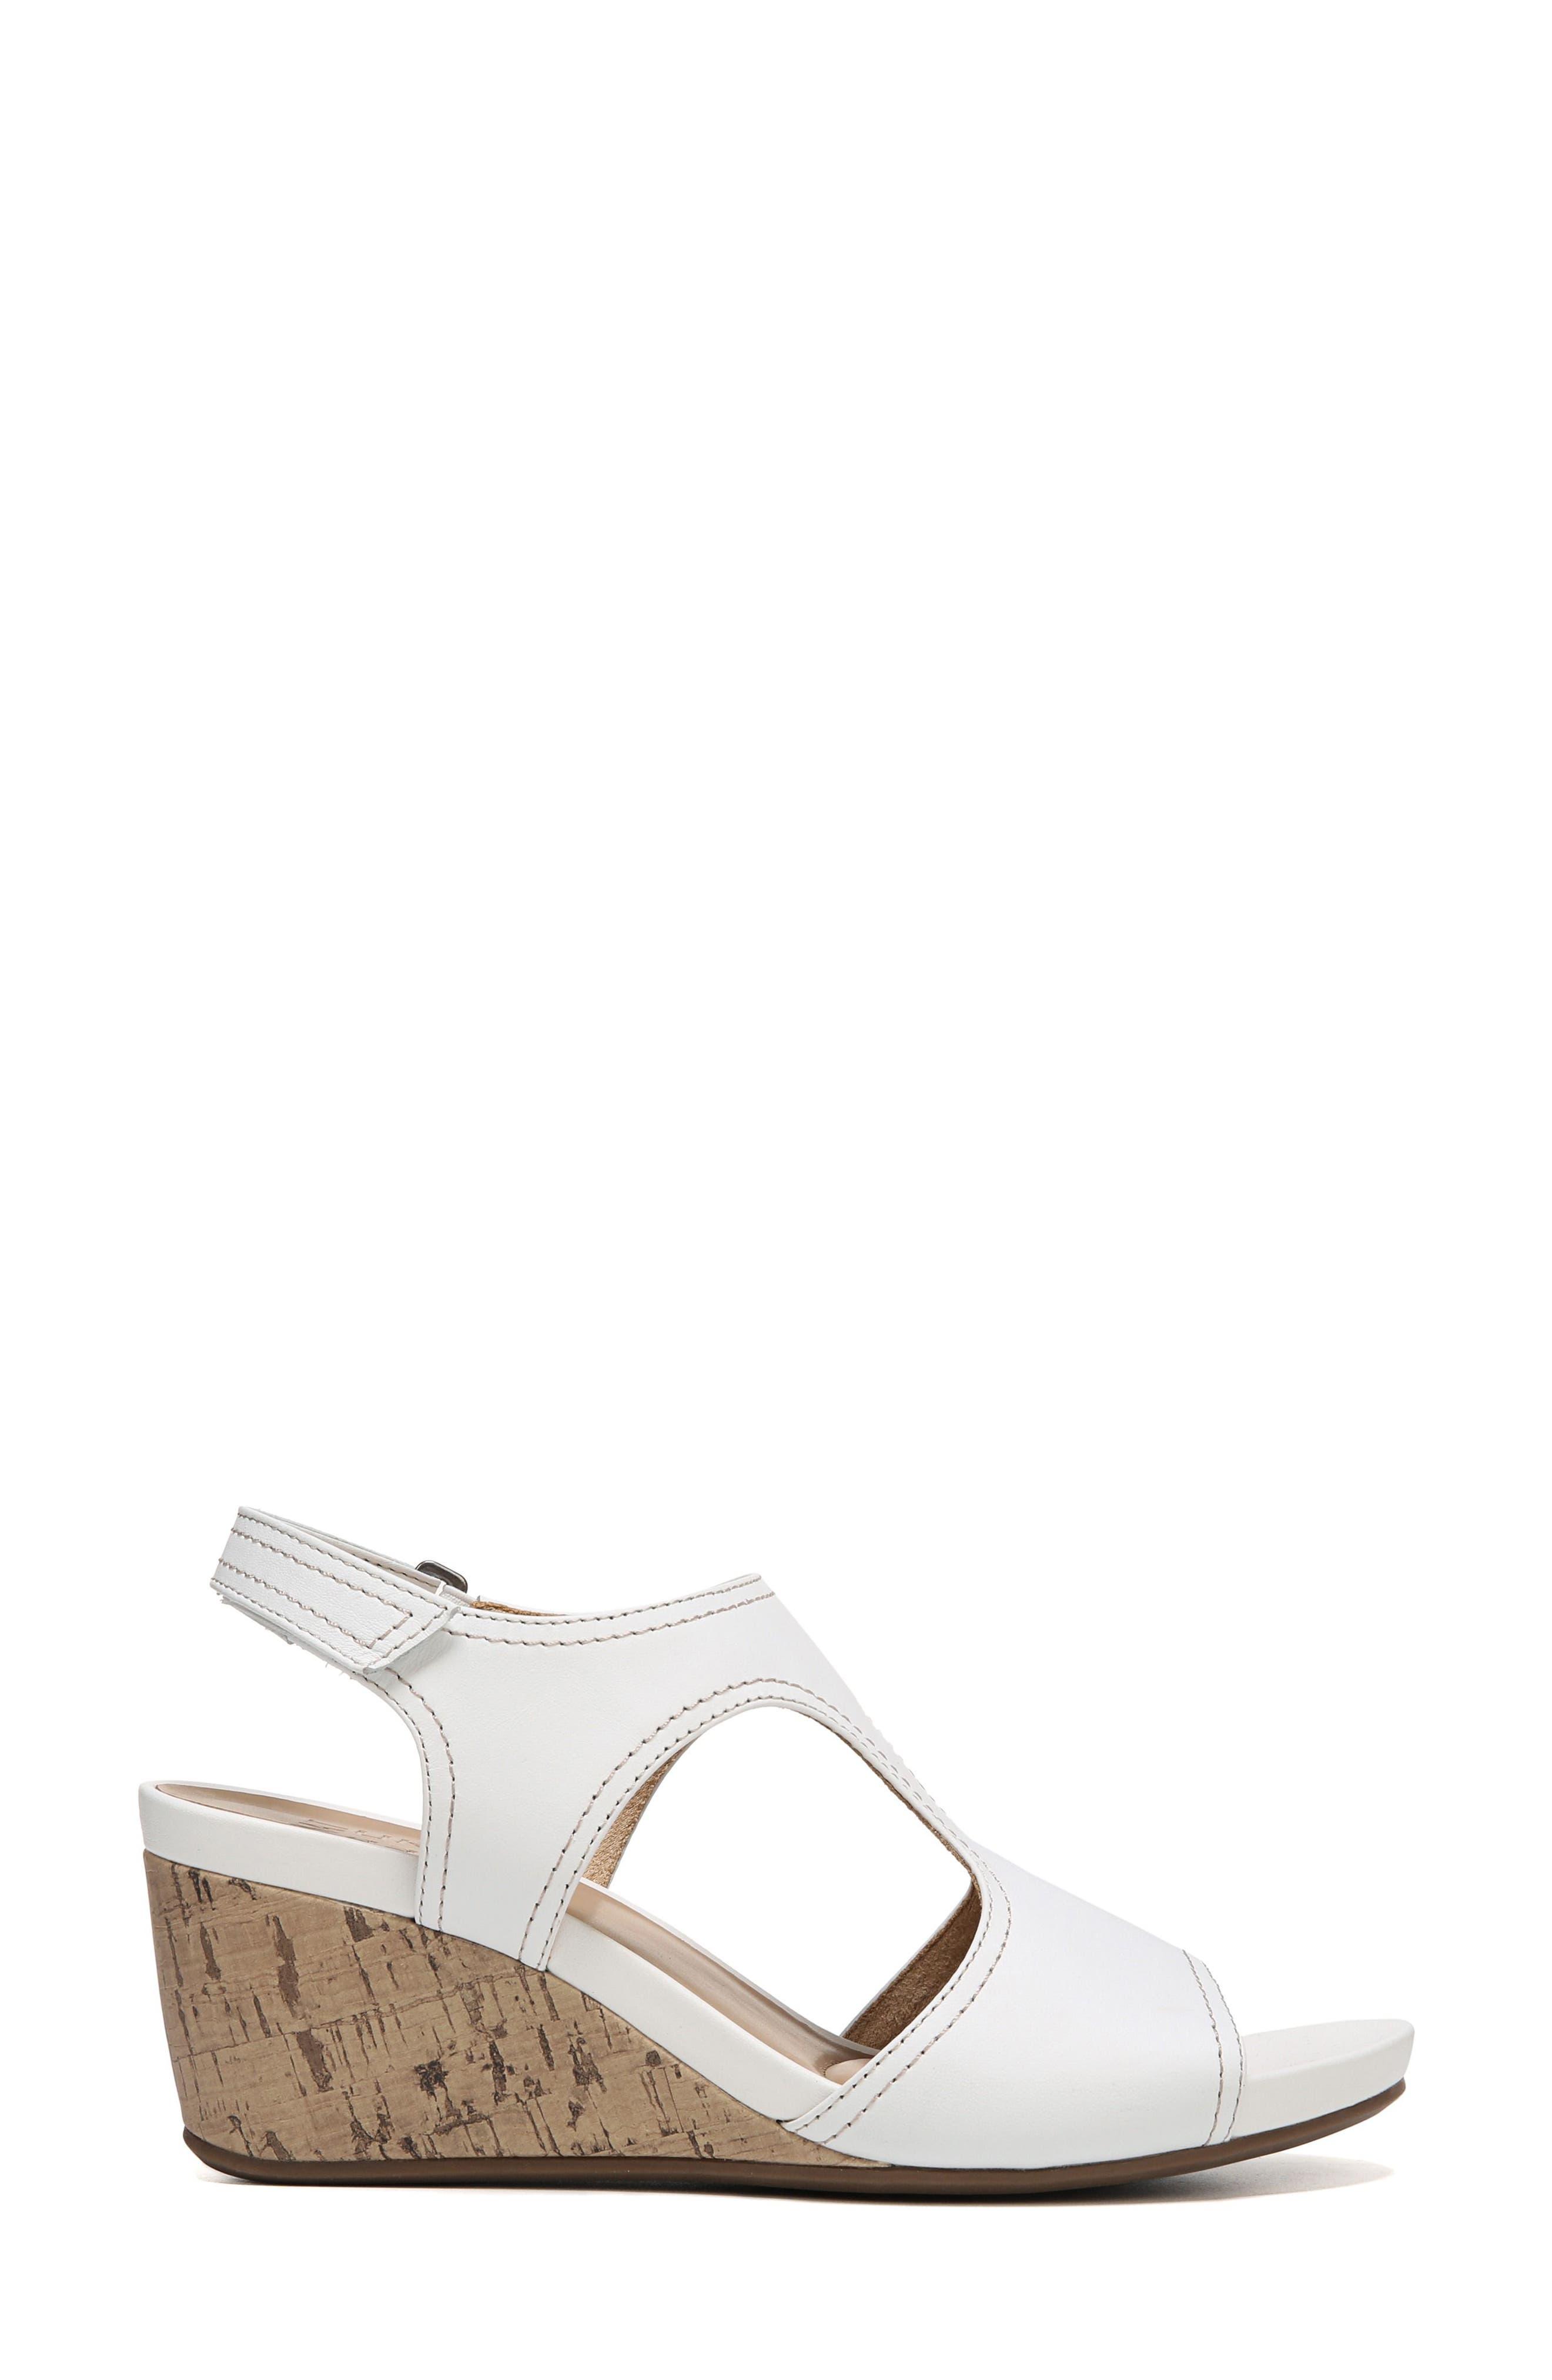 Cinda Wedge Sandal,                             Alternate thumbnail 3, color,                             White Leather